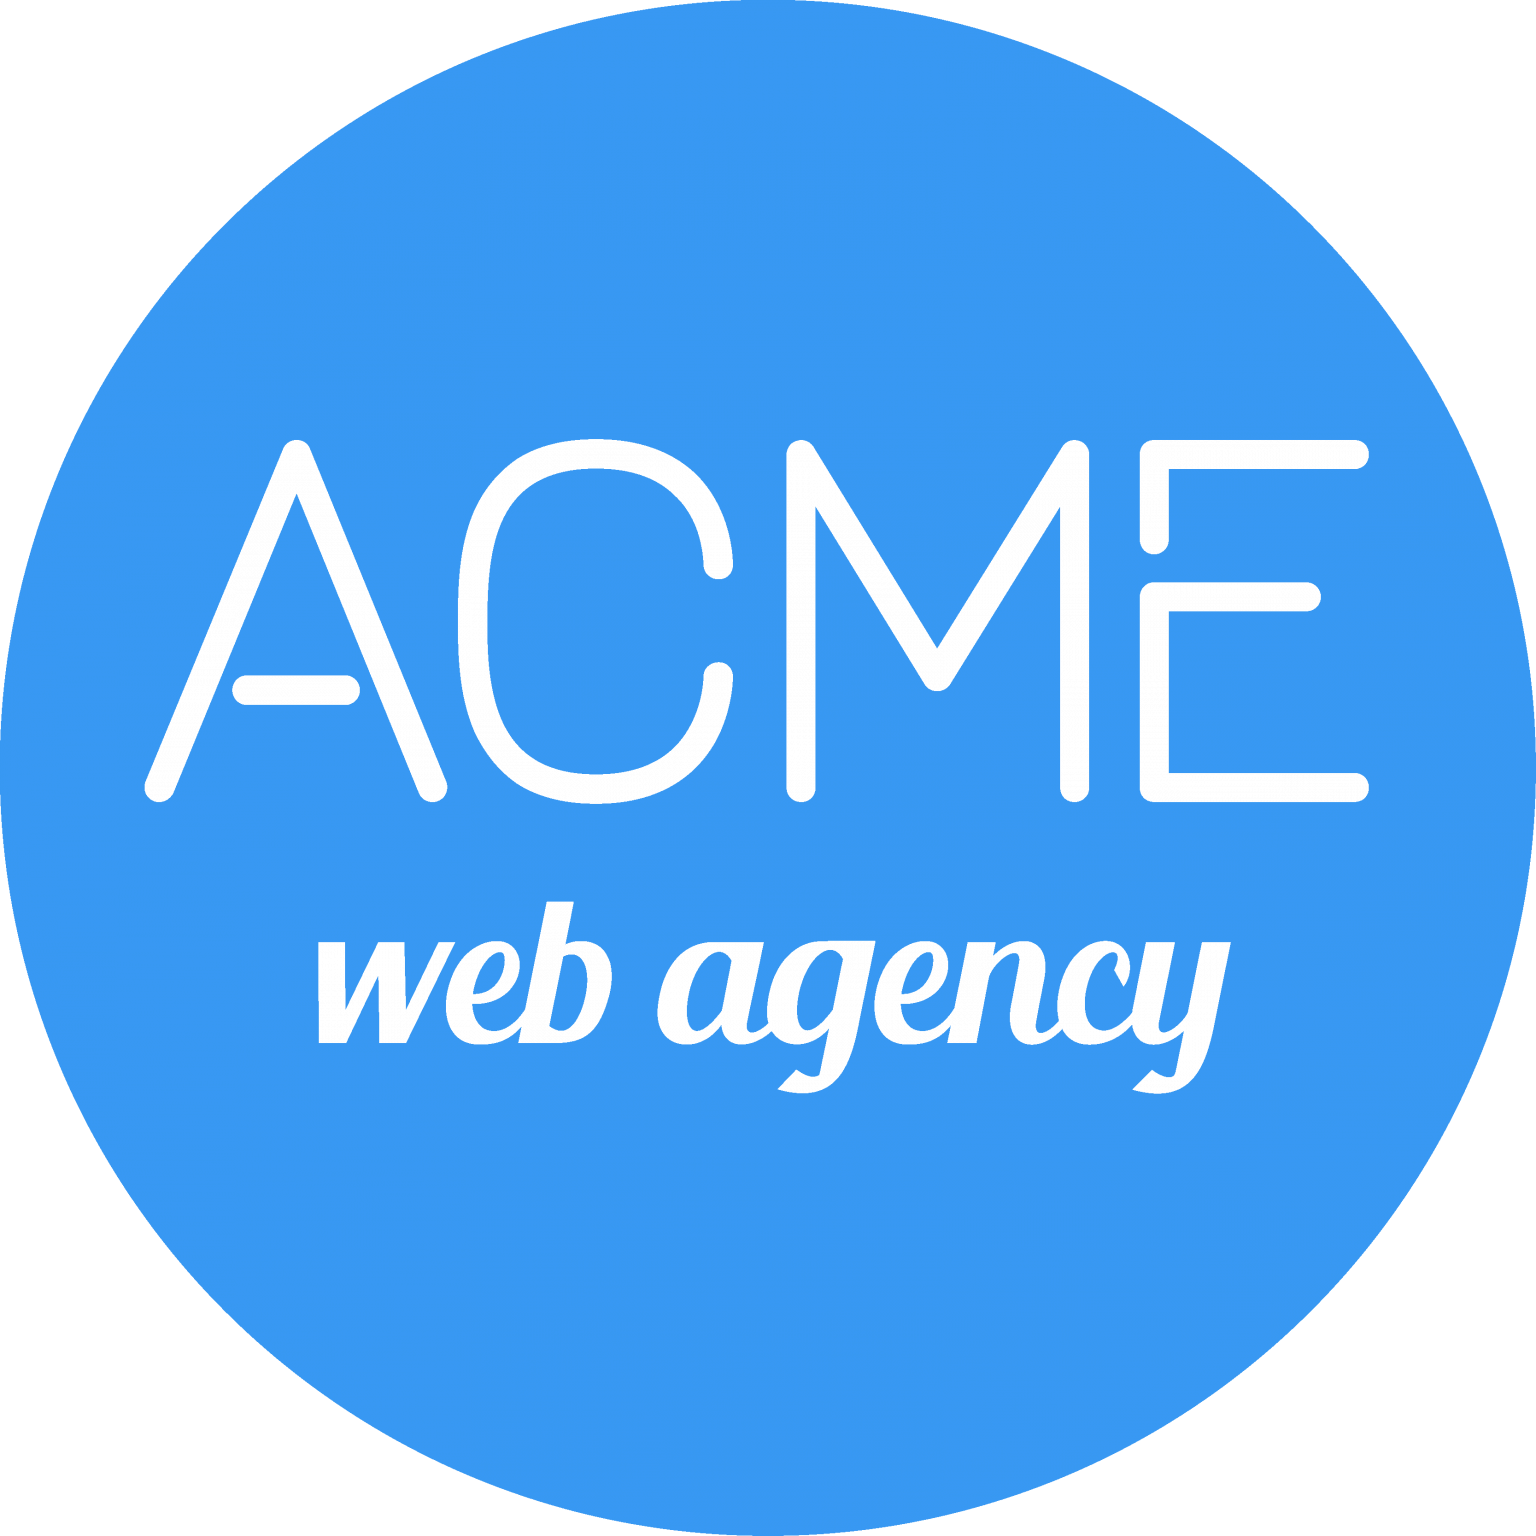 Liverpool SEO Company, Liverpool SEO Specialist, Acme web agency